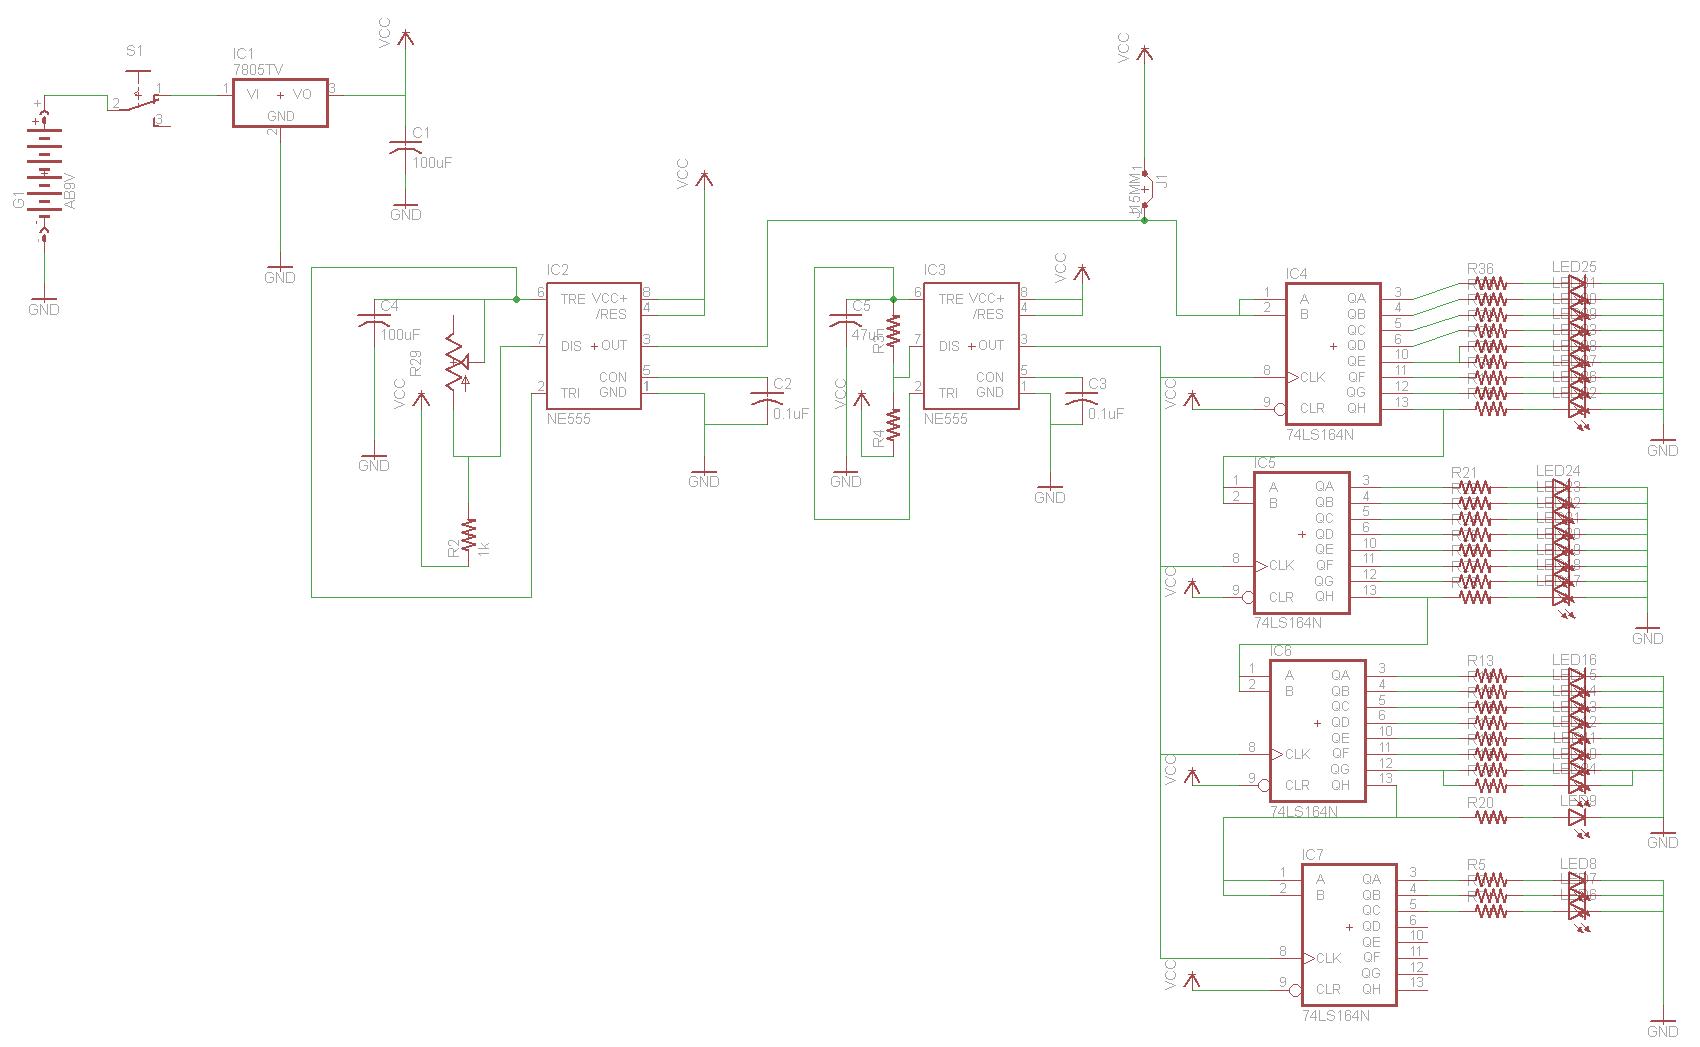 PCB Design: DIY 2 Layer Boards - Schematic | PyroElectro - News ...